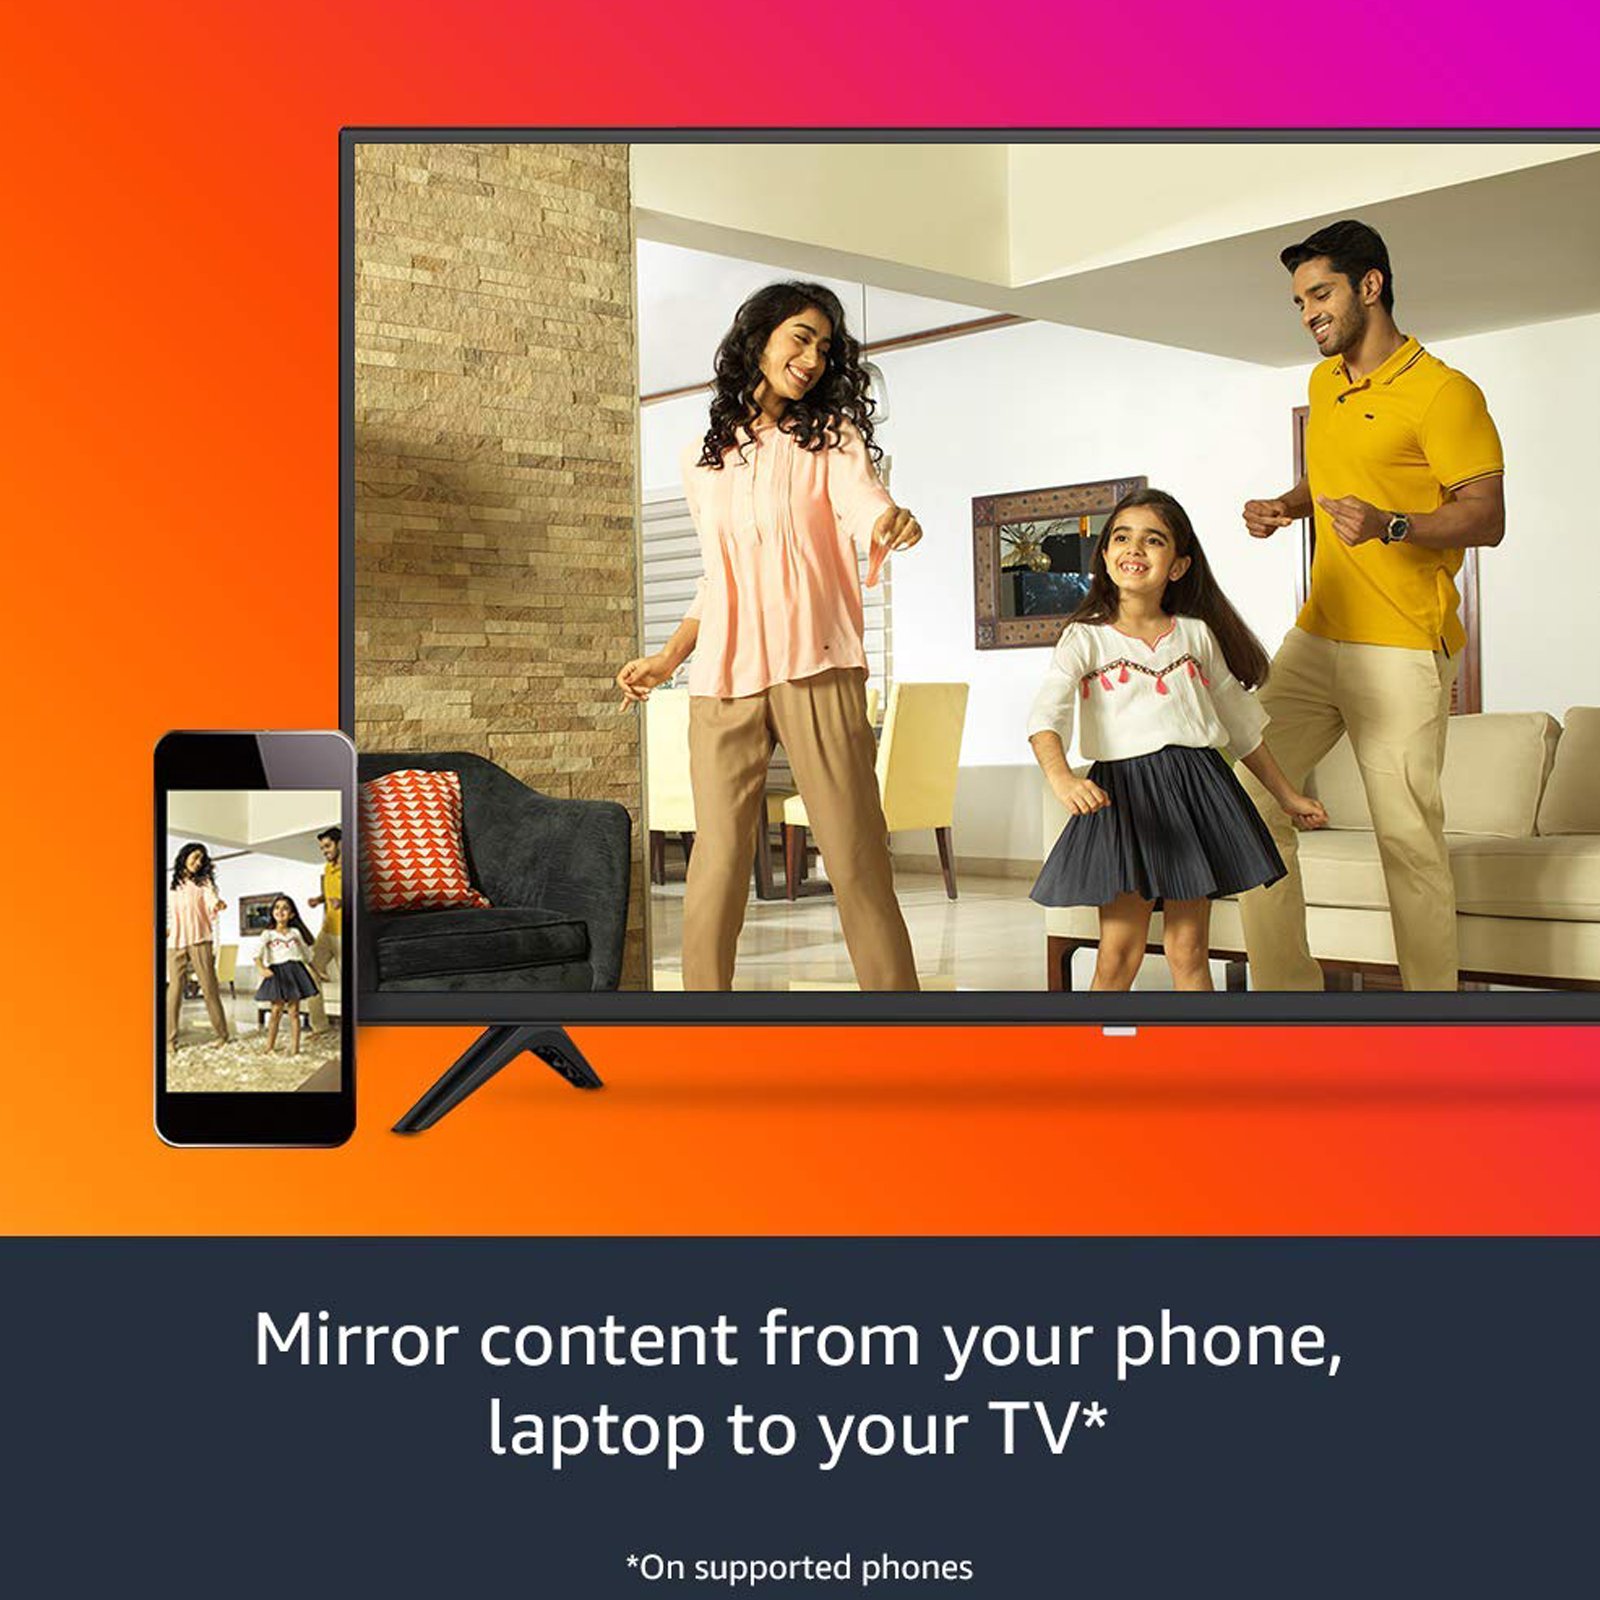 Amazon Fire TV Stick 3rd Gen with Alexa Voice Remote (Quad Core Processor, B08C1KQRR5, Black) 8